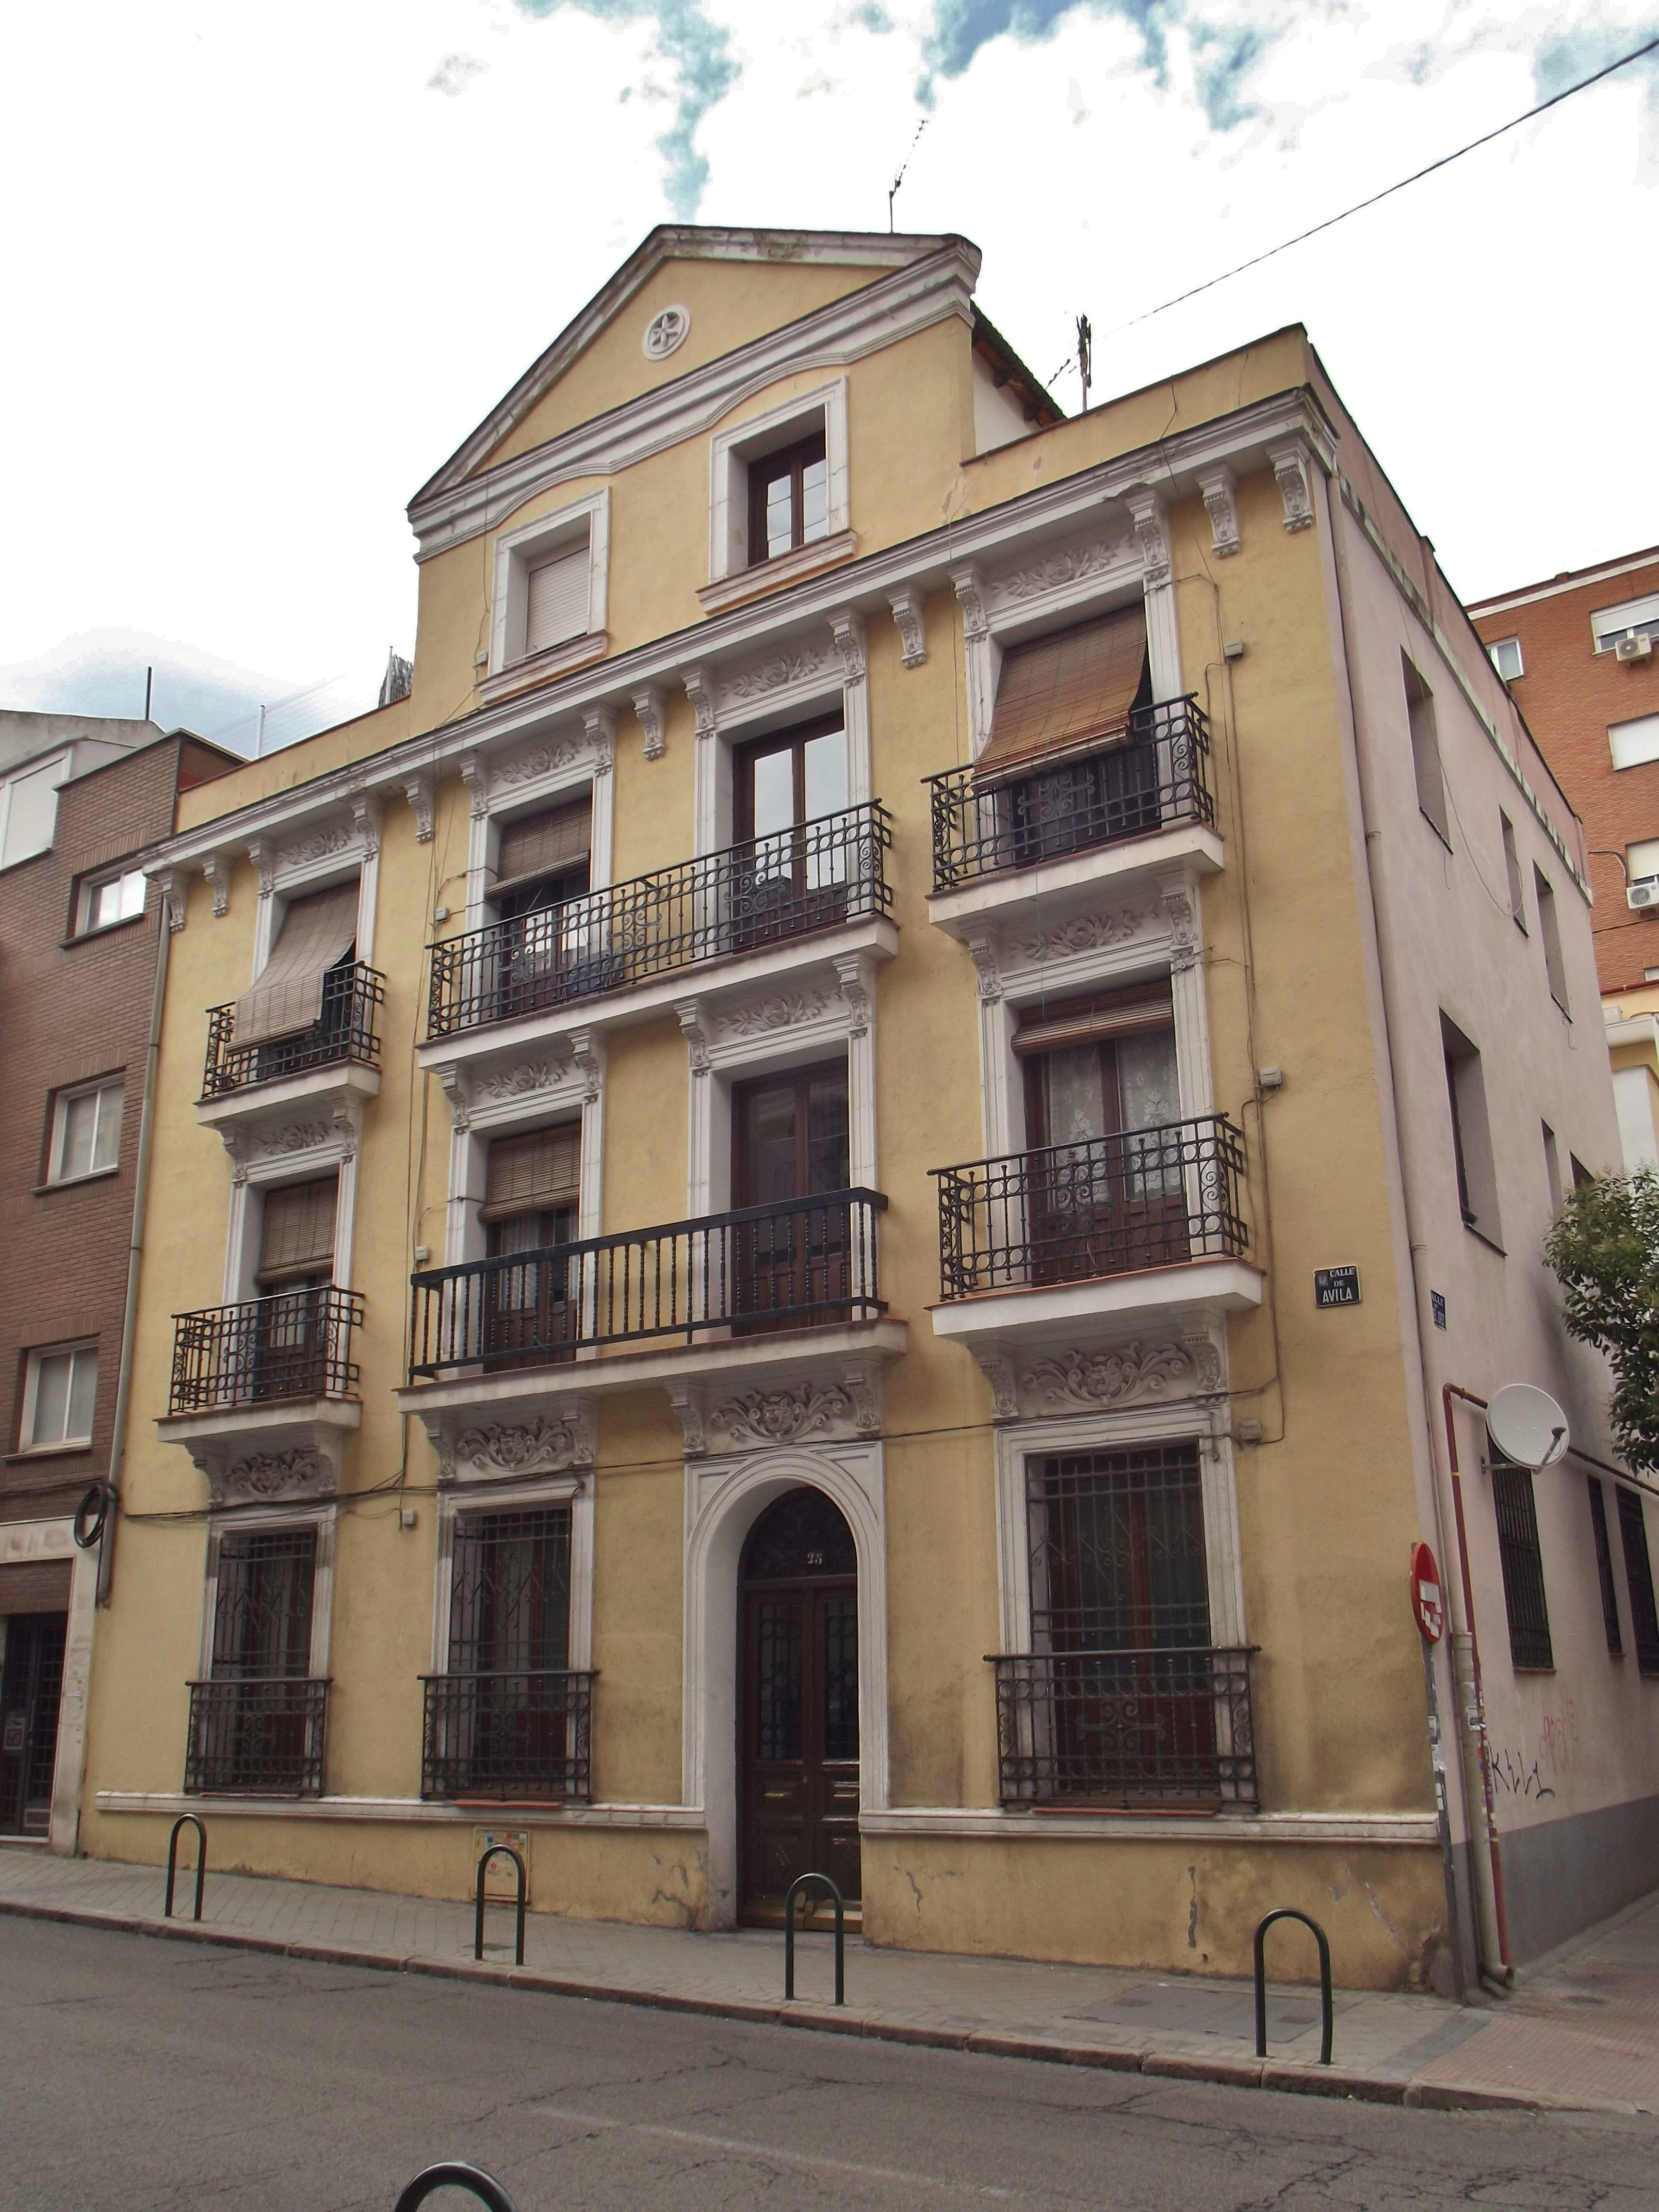 Archivo calle de vila 25 madrid jpg wikipedia la - H m calle orense madrid ...